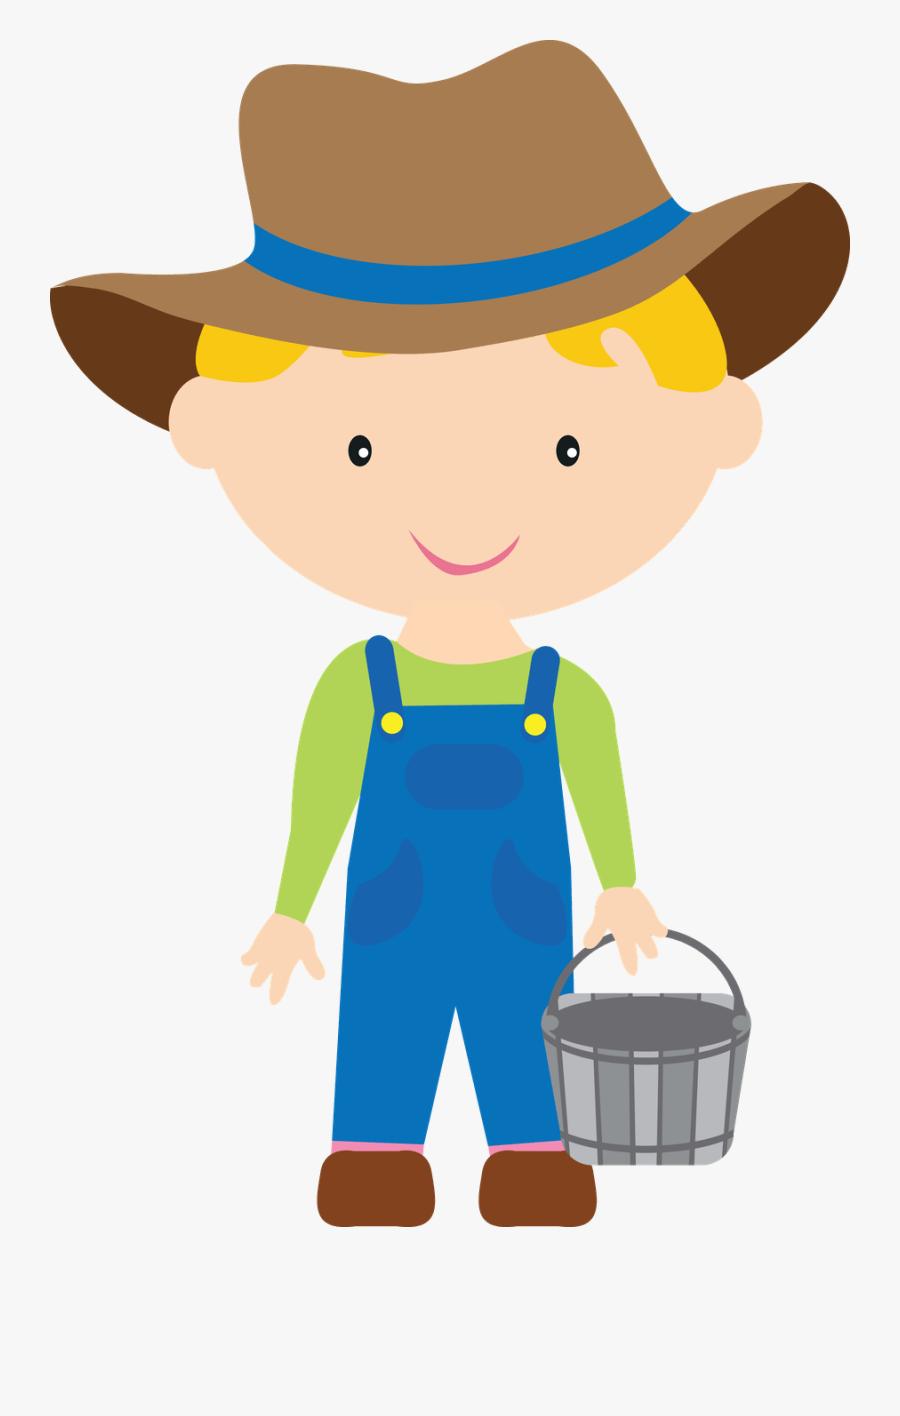 Boy Farmer Clipart - Farmer Boy Clipart, Transparent Clipart